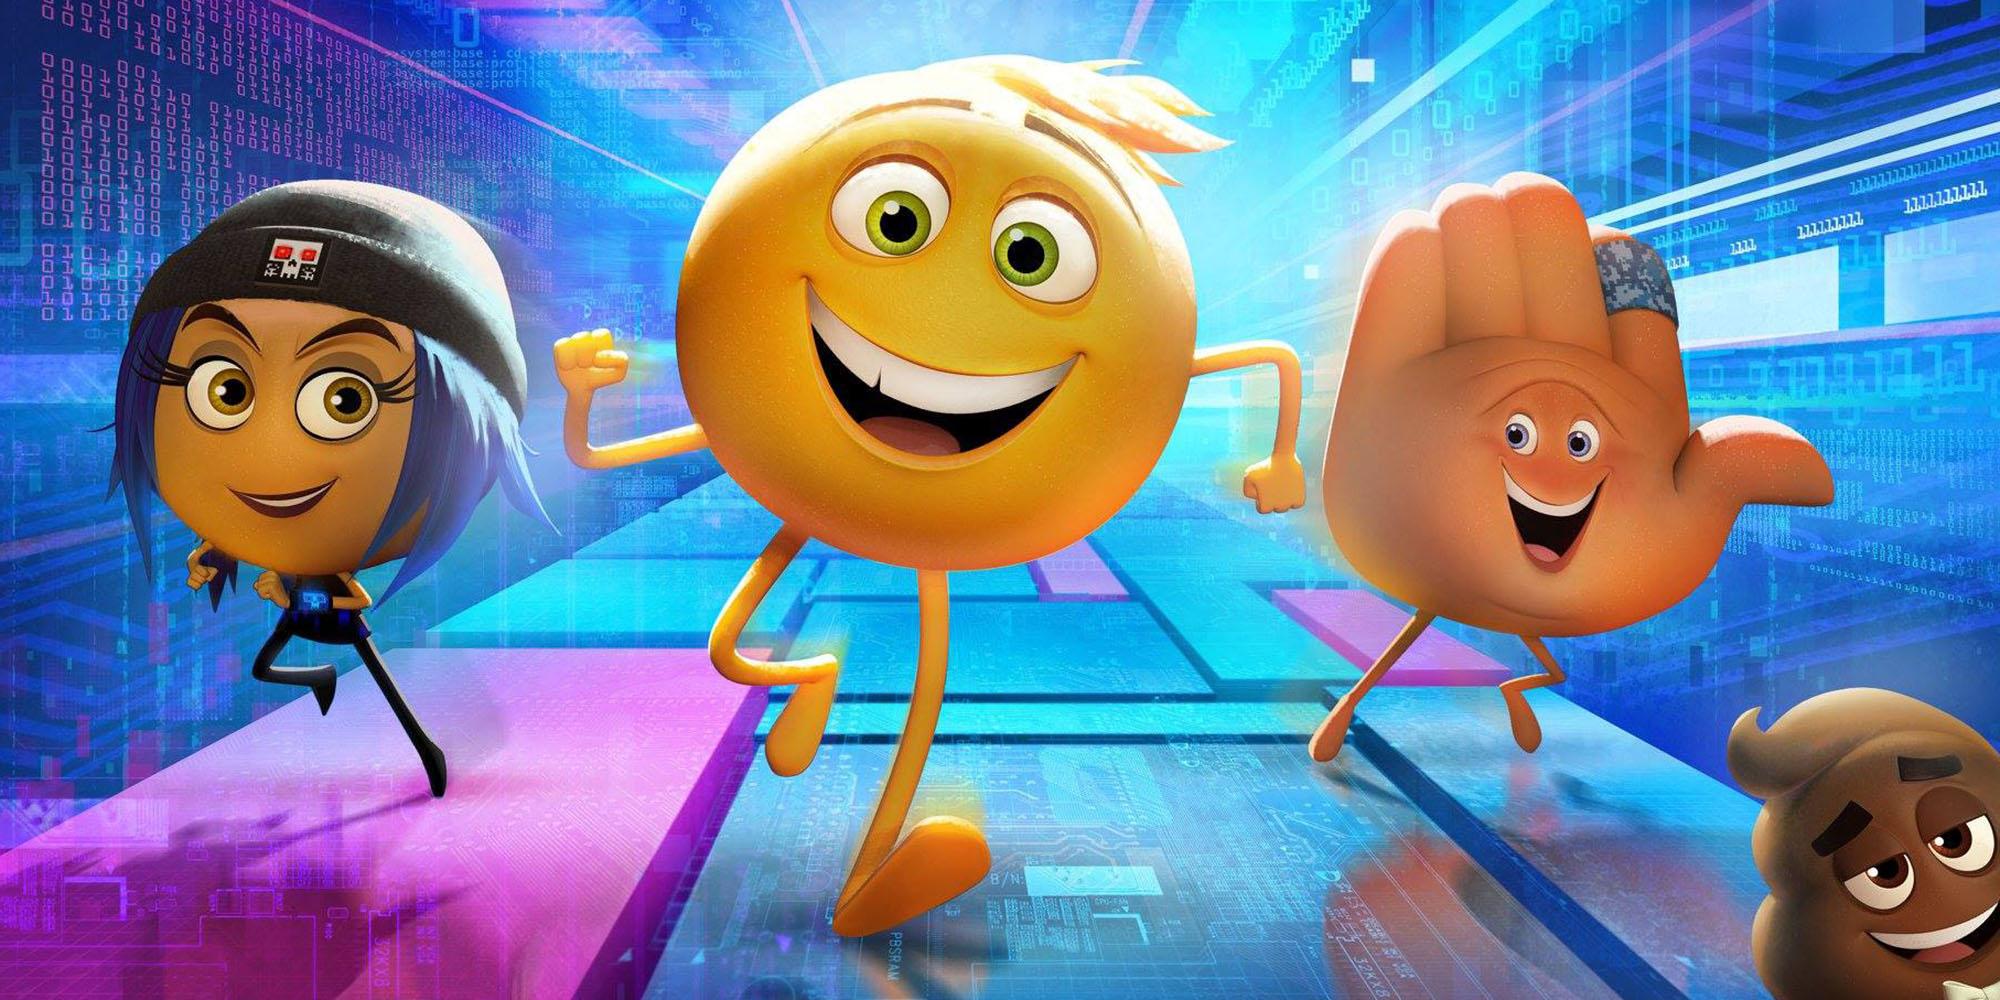 emoji-movie-still-sony-1476125868.jpg